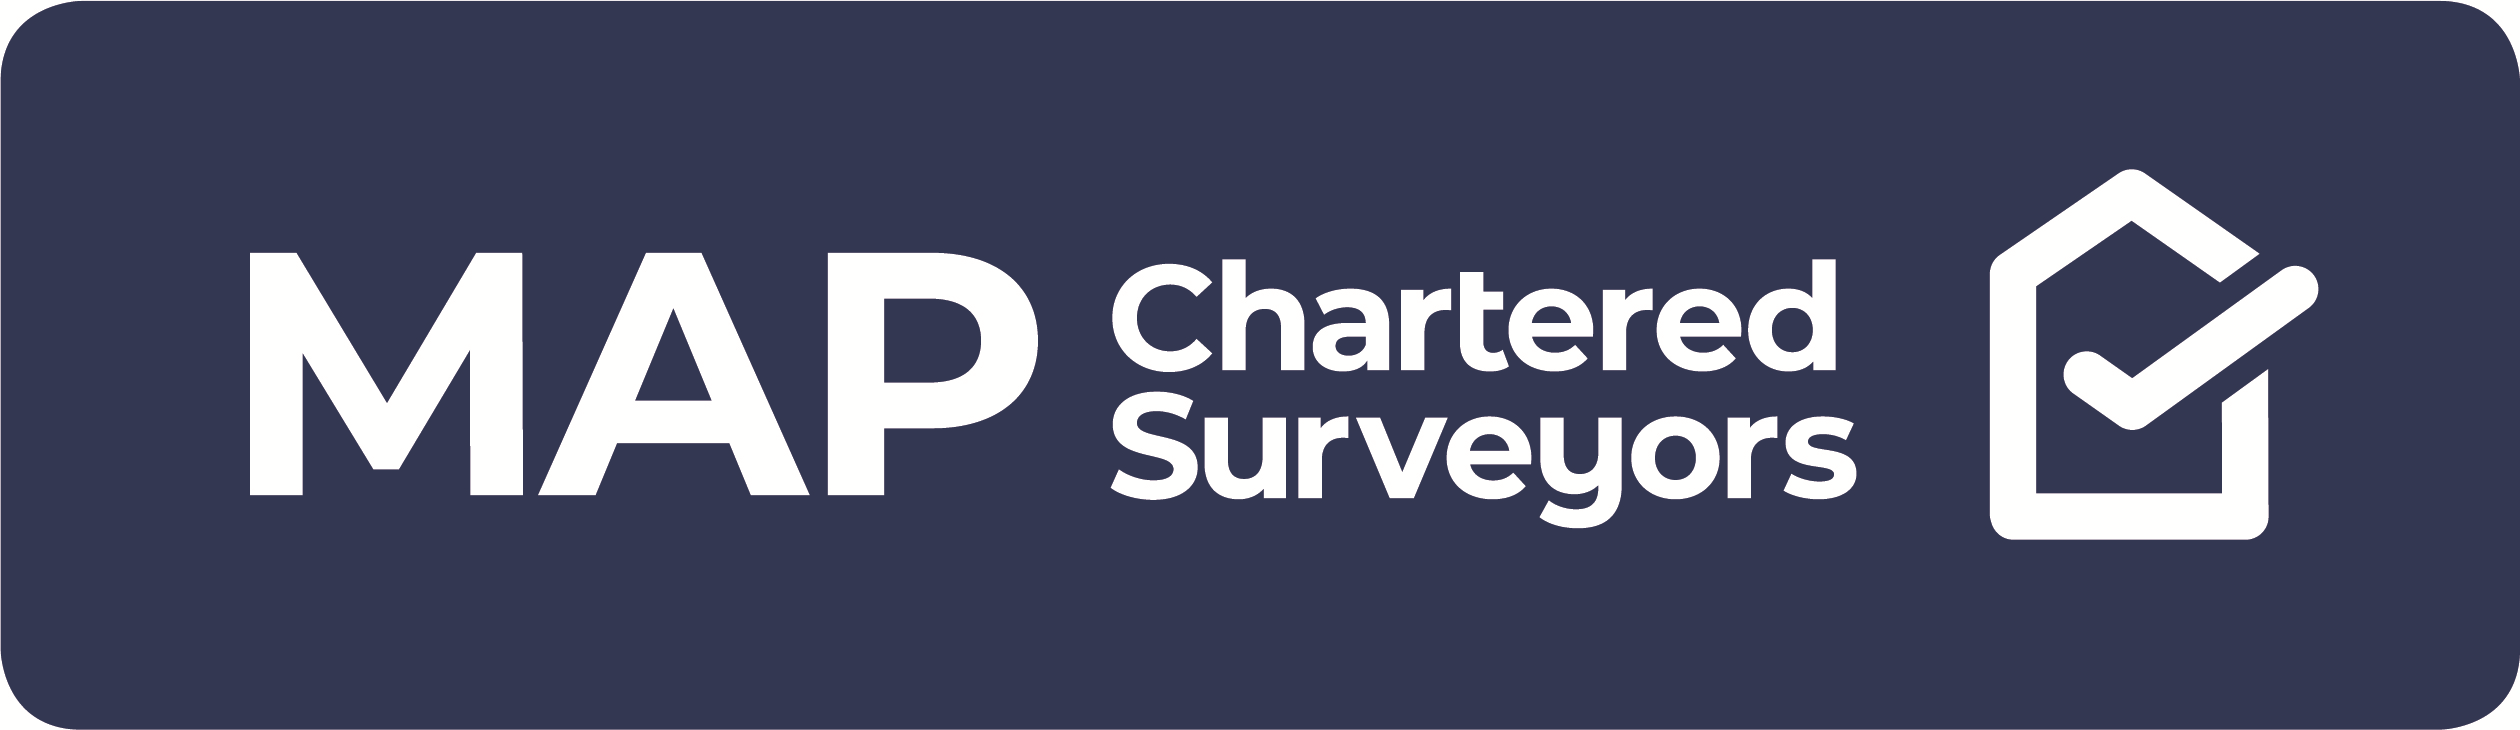 M-A-P-Chartered-Surveyors